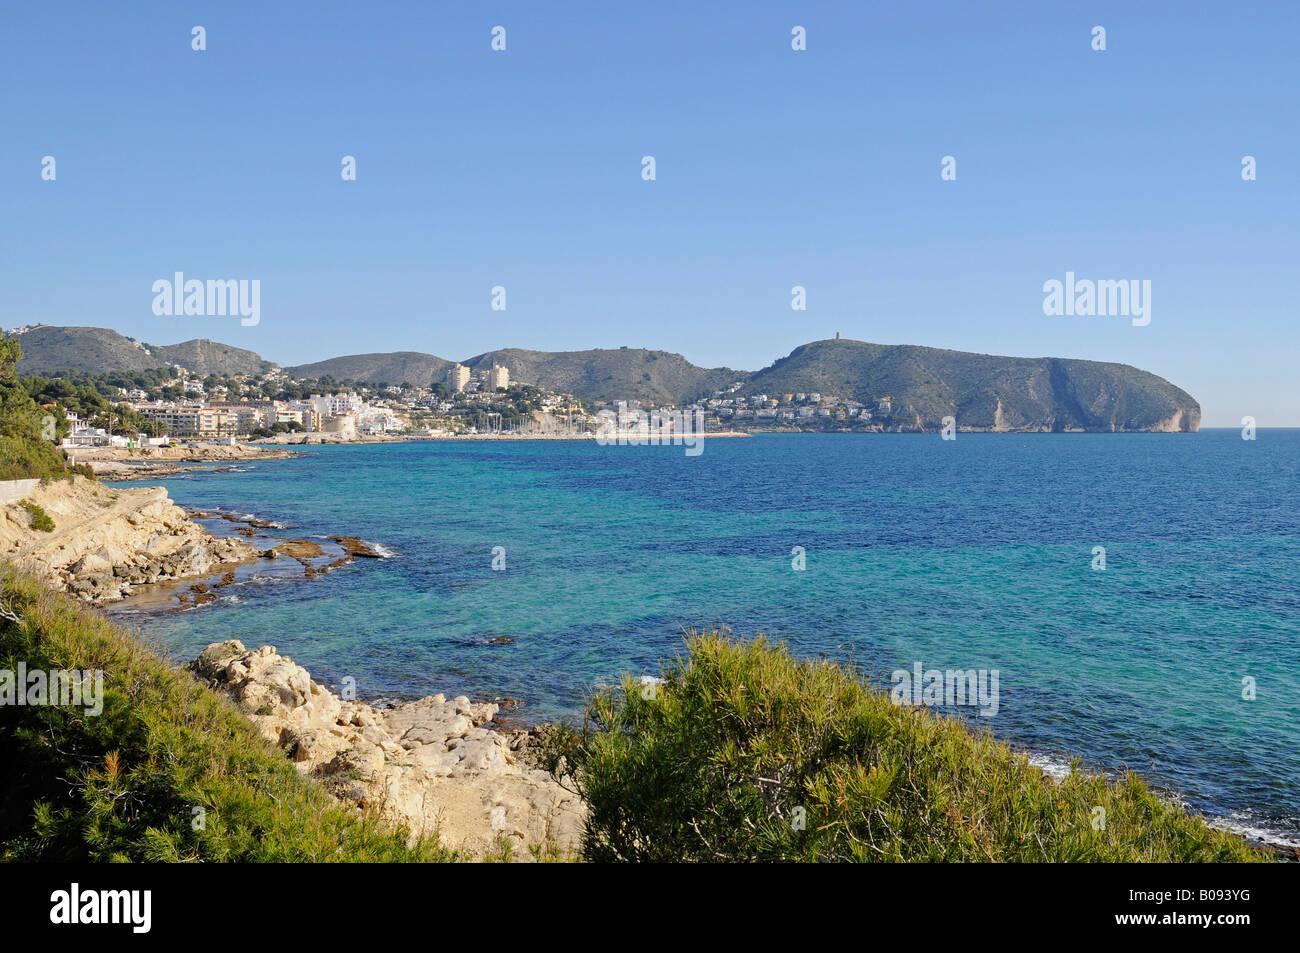 Coast, Moraira, Alicante, Costa Blanca, Spain - Stock Image